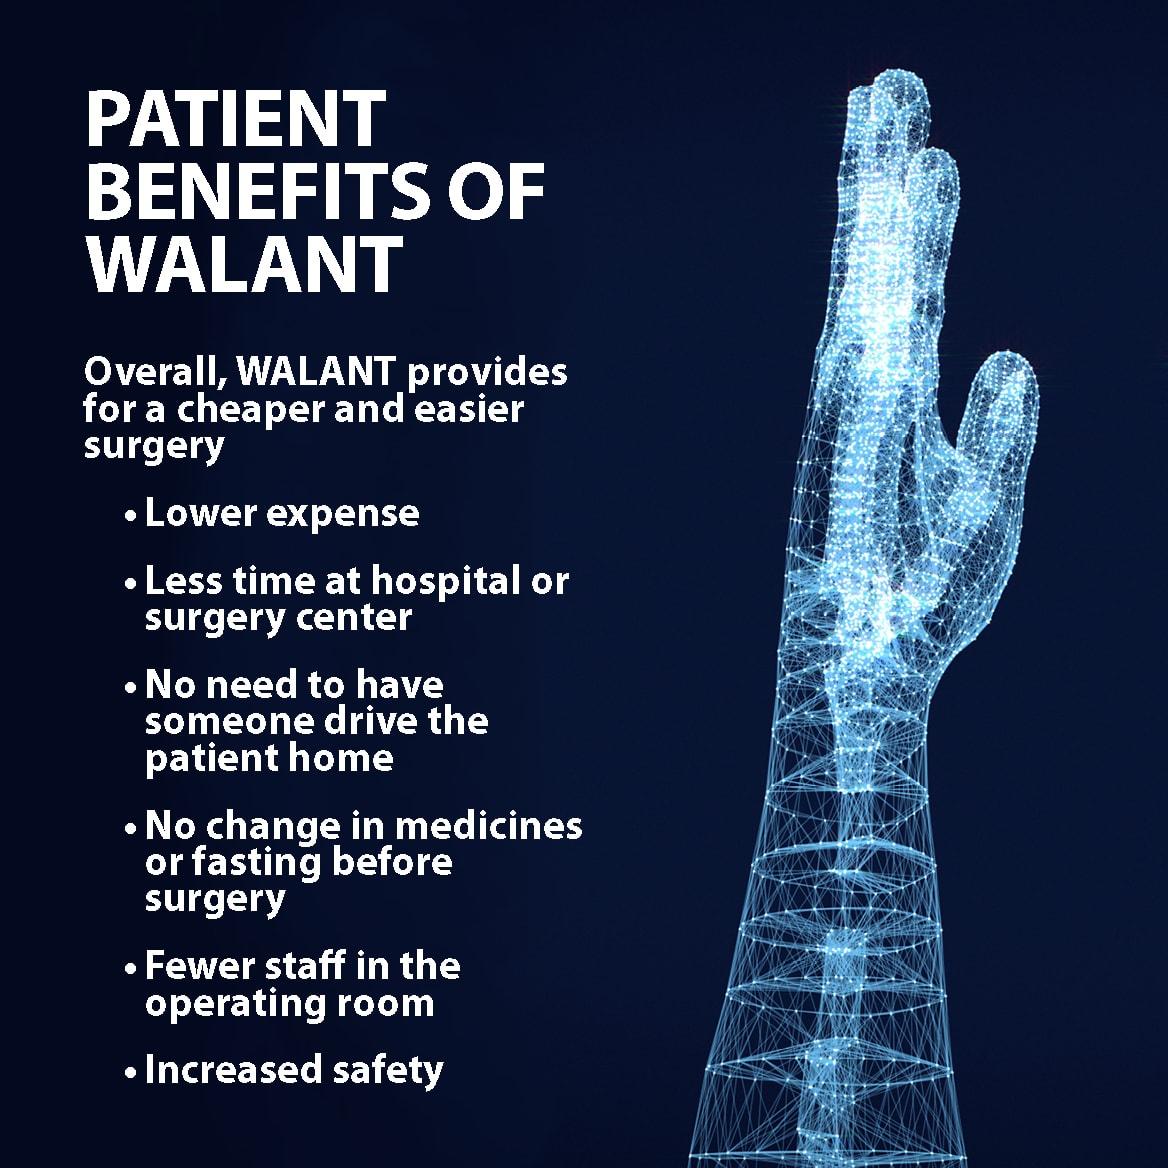 WALANT Benefits